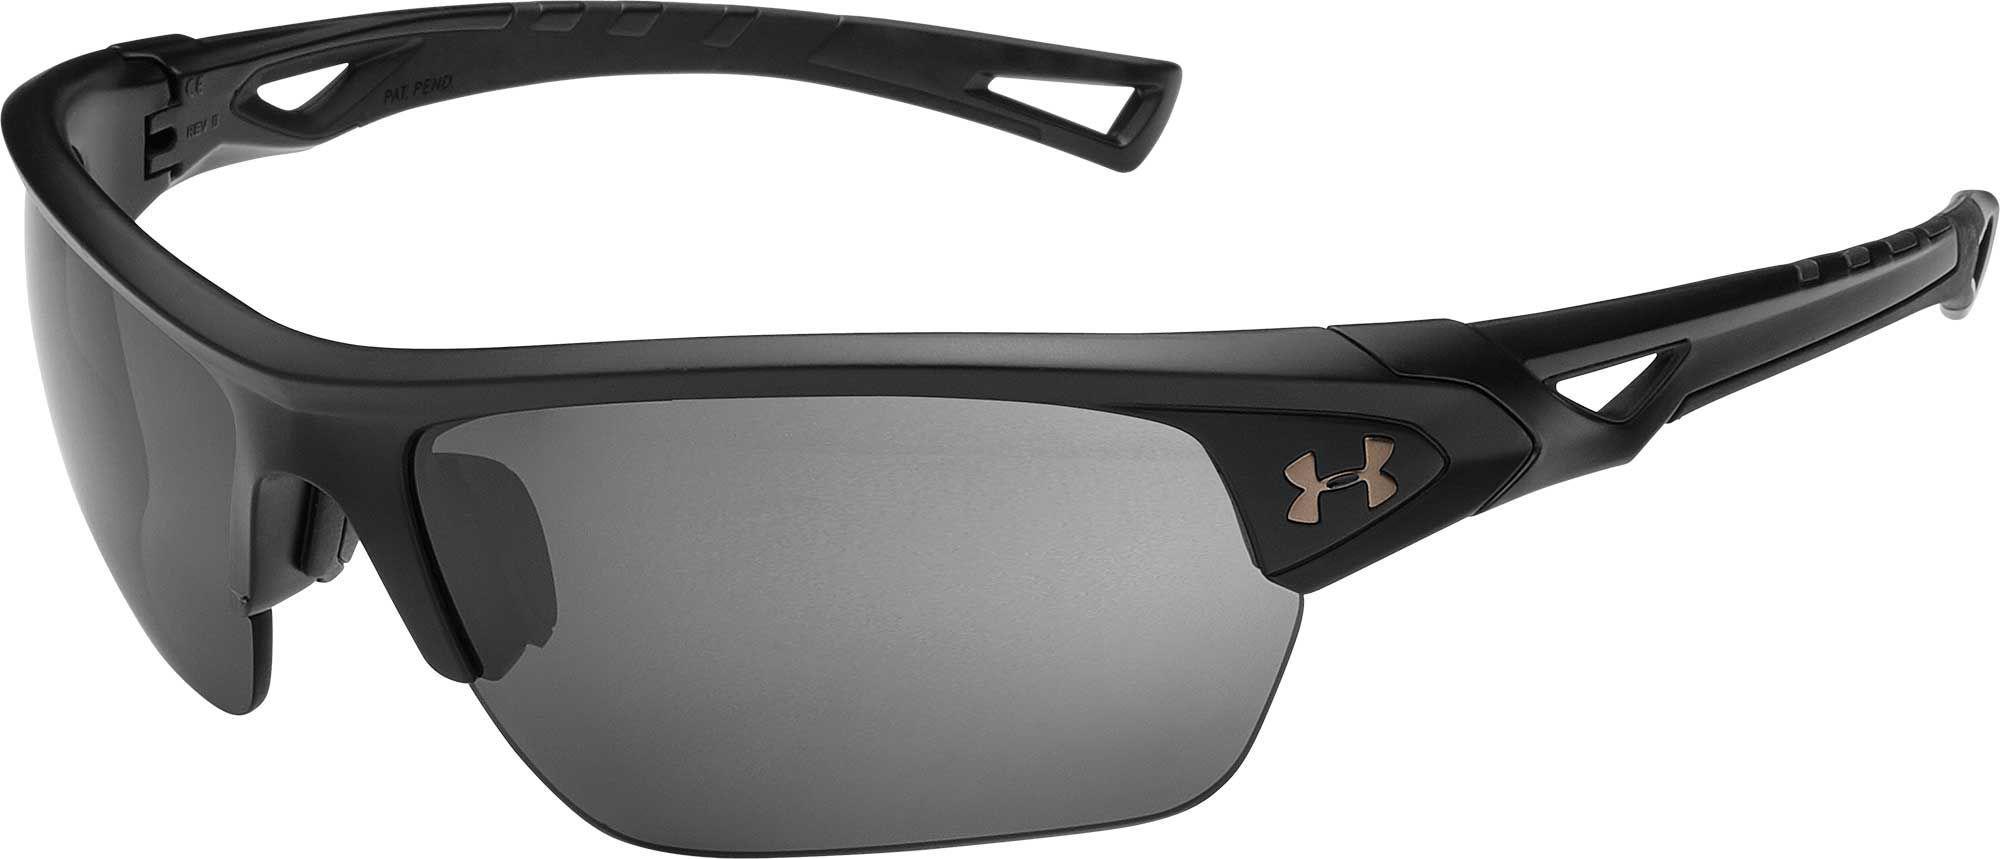 9f3af746d62 Lyst - Under Armour Octane Running Polarized Sunglasses in Black for Men